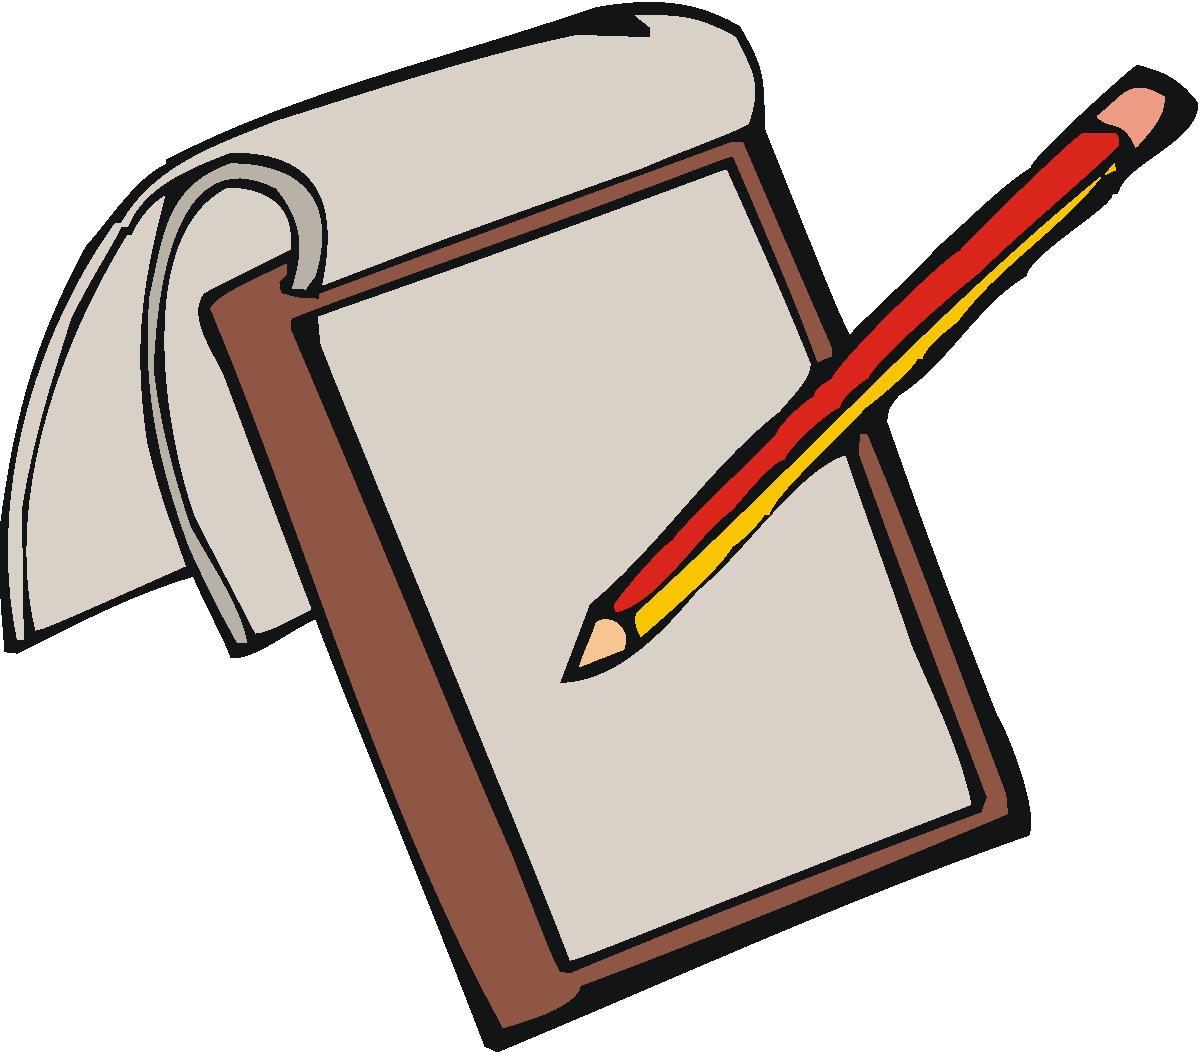 Pencil Writing Clip Art | Clipart Panda - Free Clipart Images